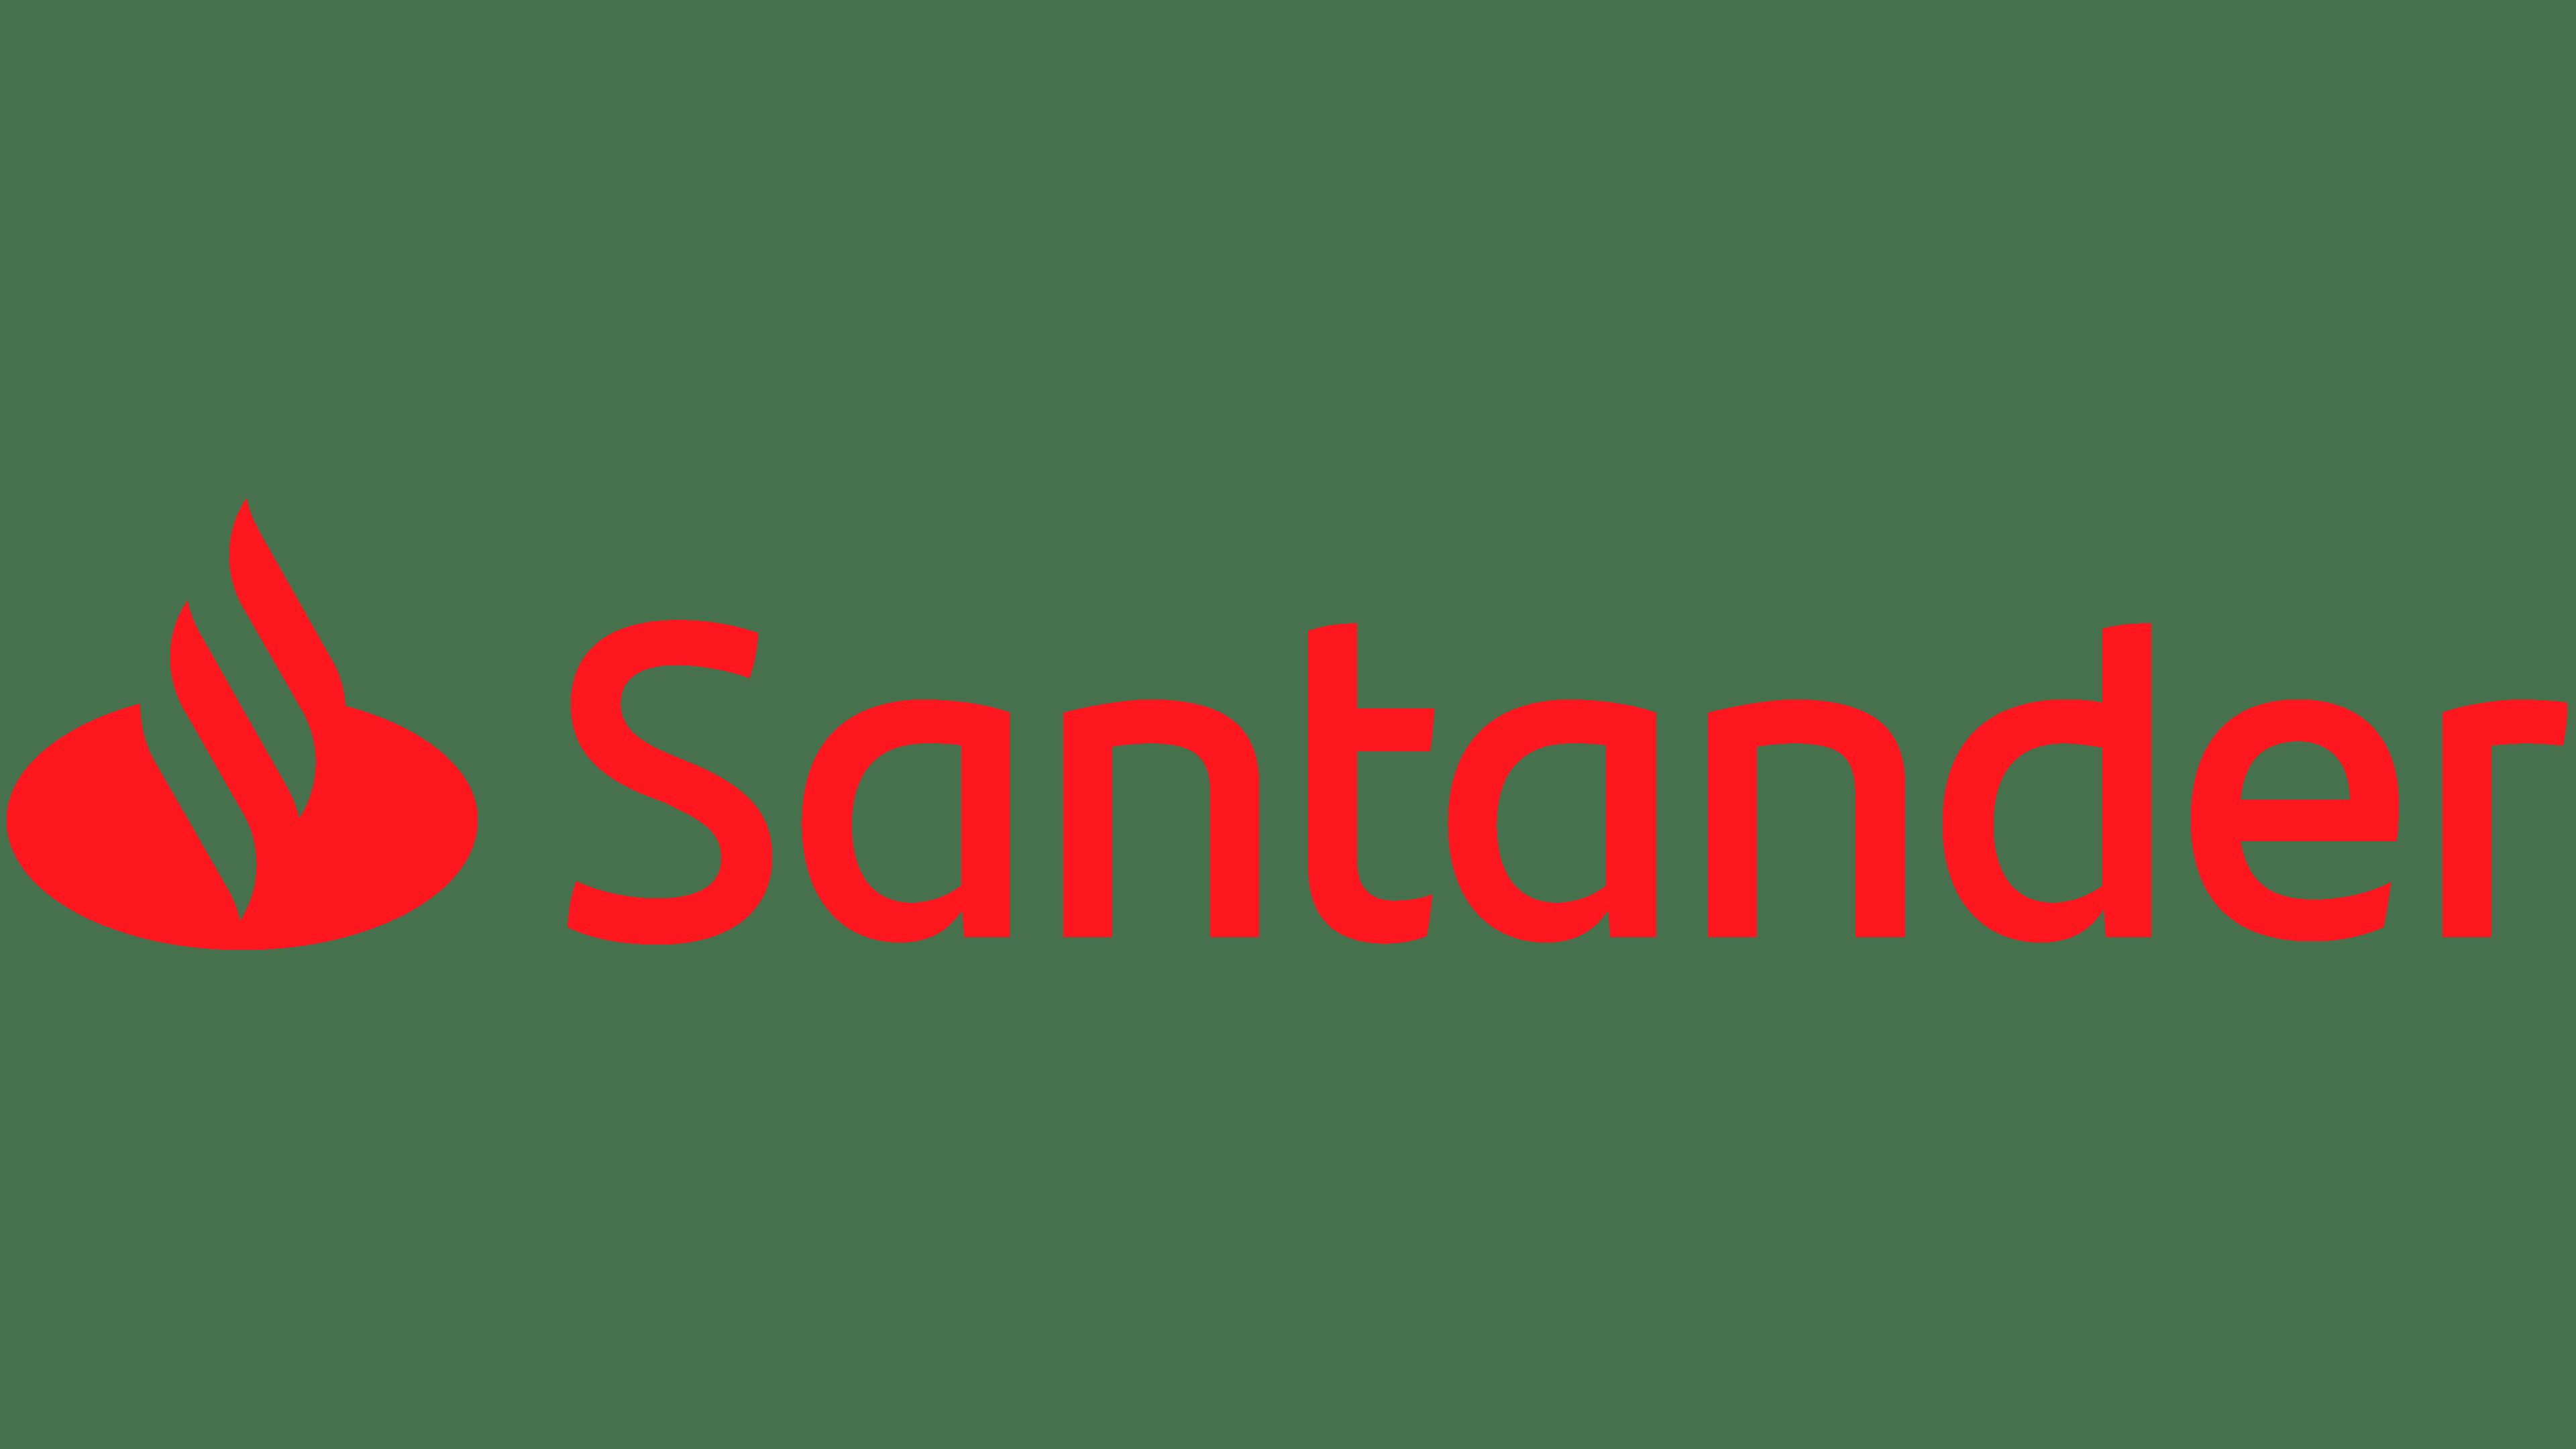 Car Logos With Names >> Santander Logo, Santander Symbol, Meaning, History and Evolution